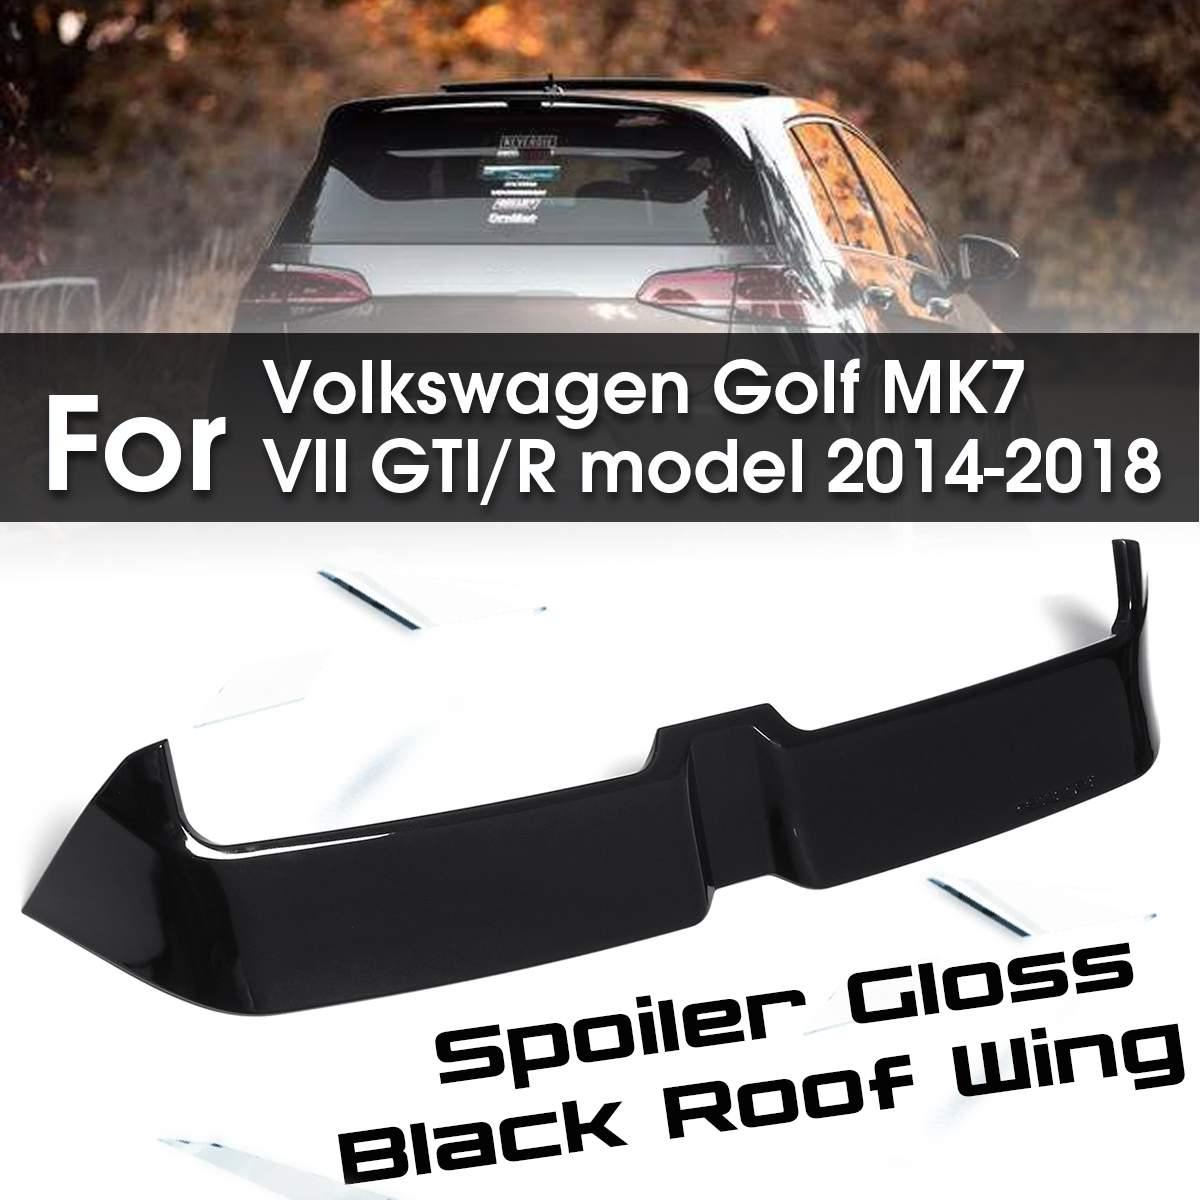 for MK7 Car-styling Carbon Fiber / ABS Gloss Black Rear Wing Spoiler for Volkswagen MK7 VII O Style Golf 7 GTI Rfor MK7 Car-styling Carbon Fiber / ABS Gloss Black Rear Wing Spoiler for Volkswagen MK7 VII O Style Golf 7 GTI R